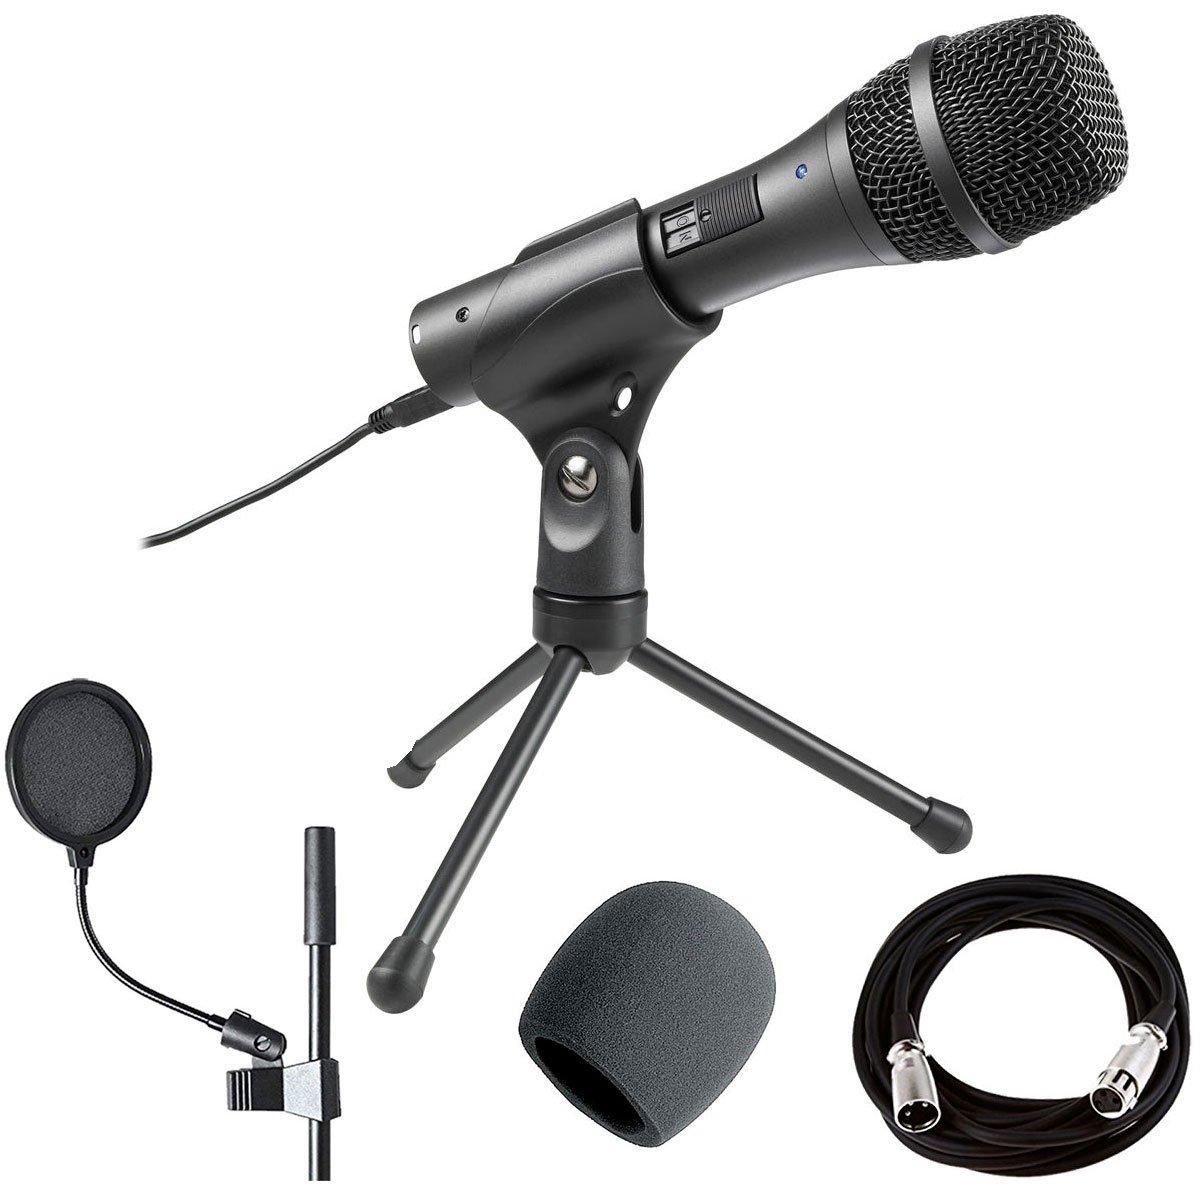 "Audio-Technica AT2005USB Cardioid Dynamic USB/XLR Microphone + On Stage XLR Mic Cable + Foam Windscreen, Black & Pop Blocker 4"" + Accessory Bundle"